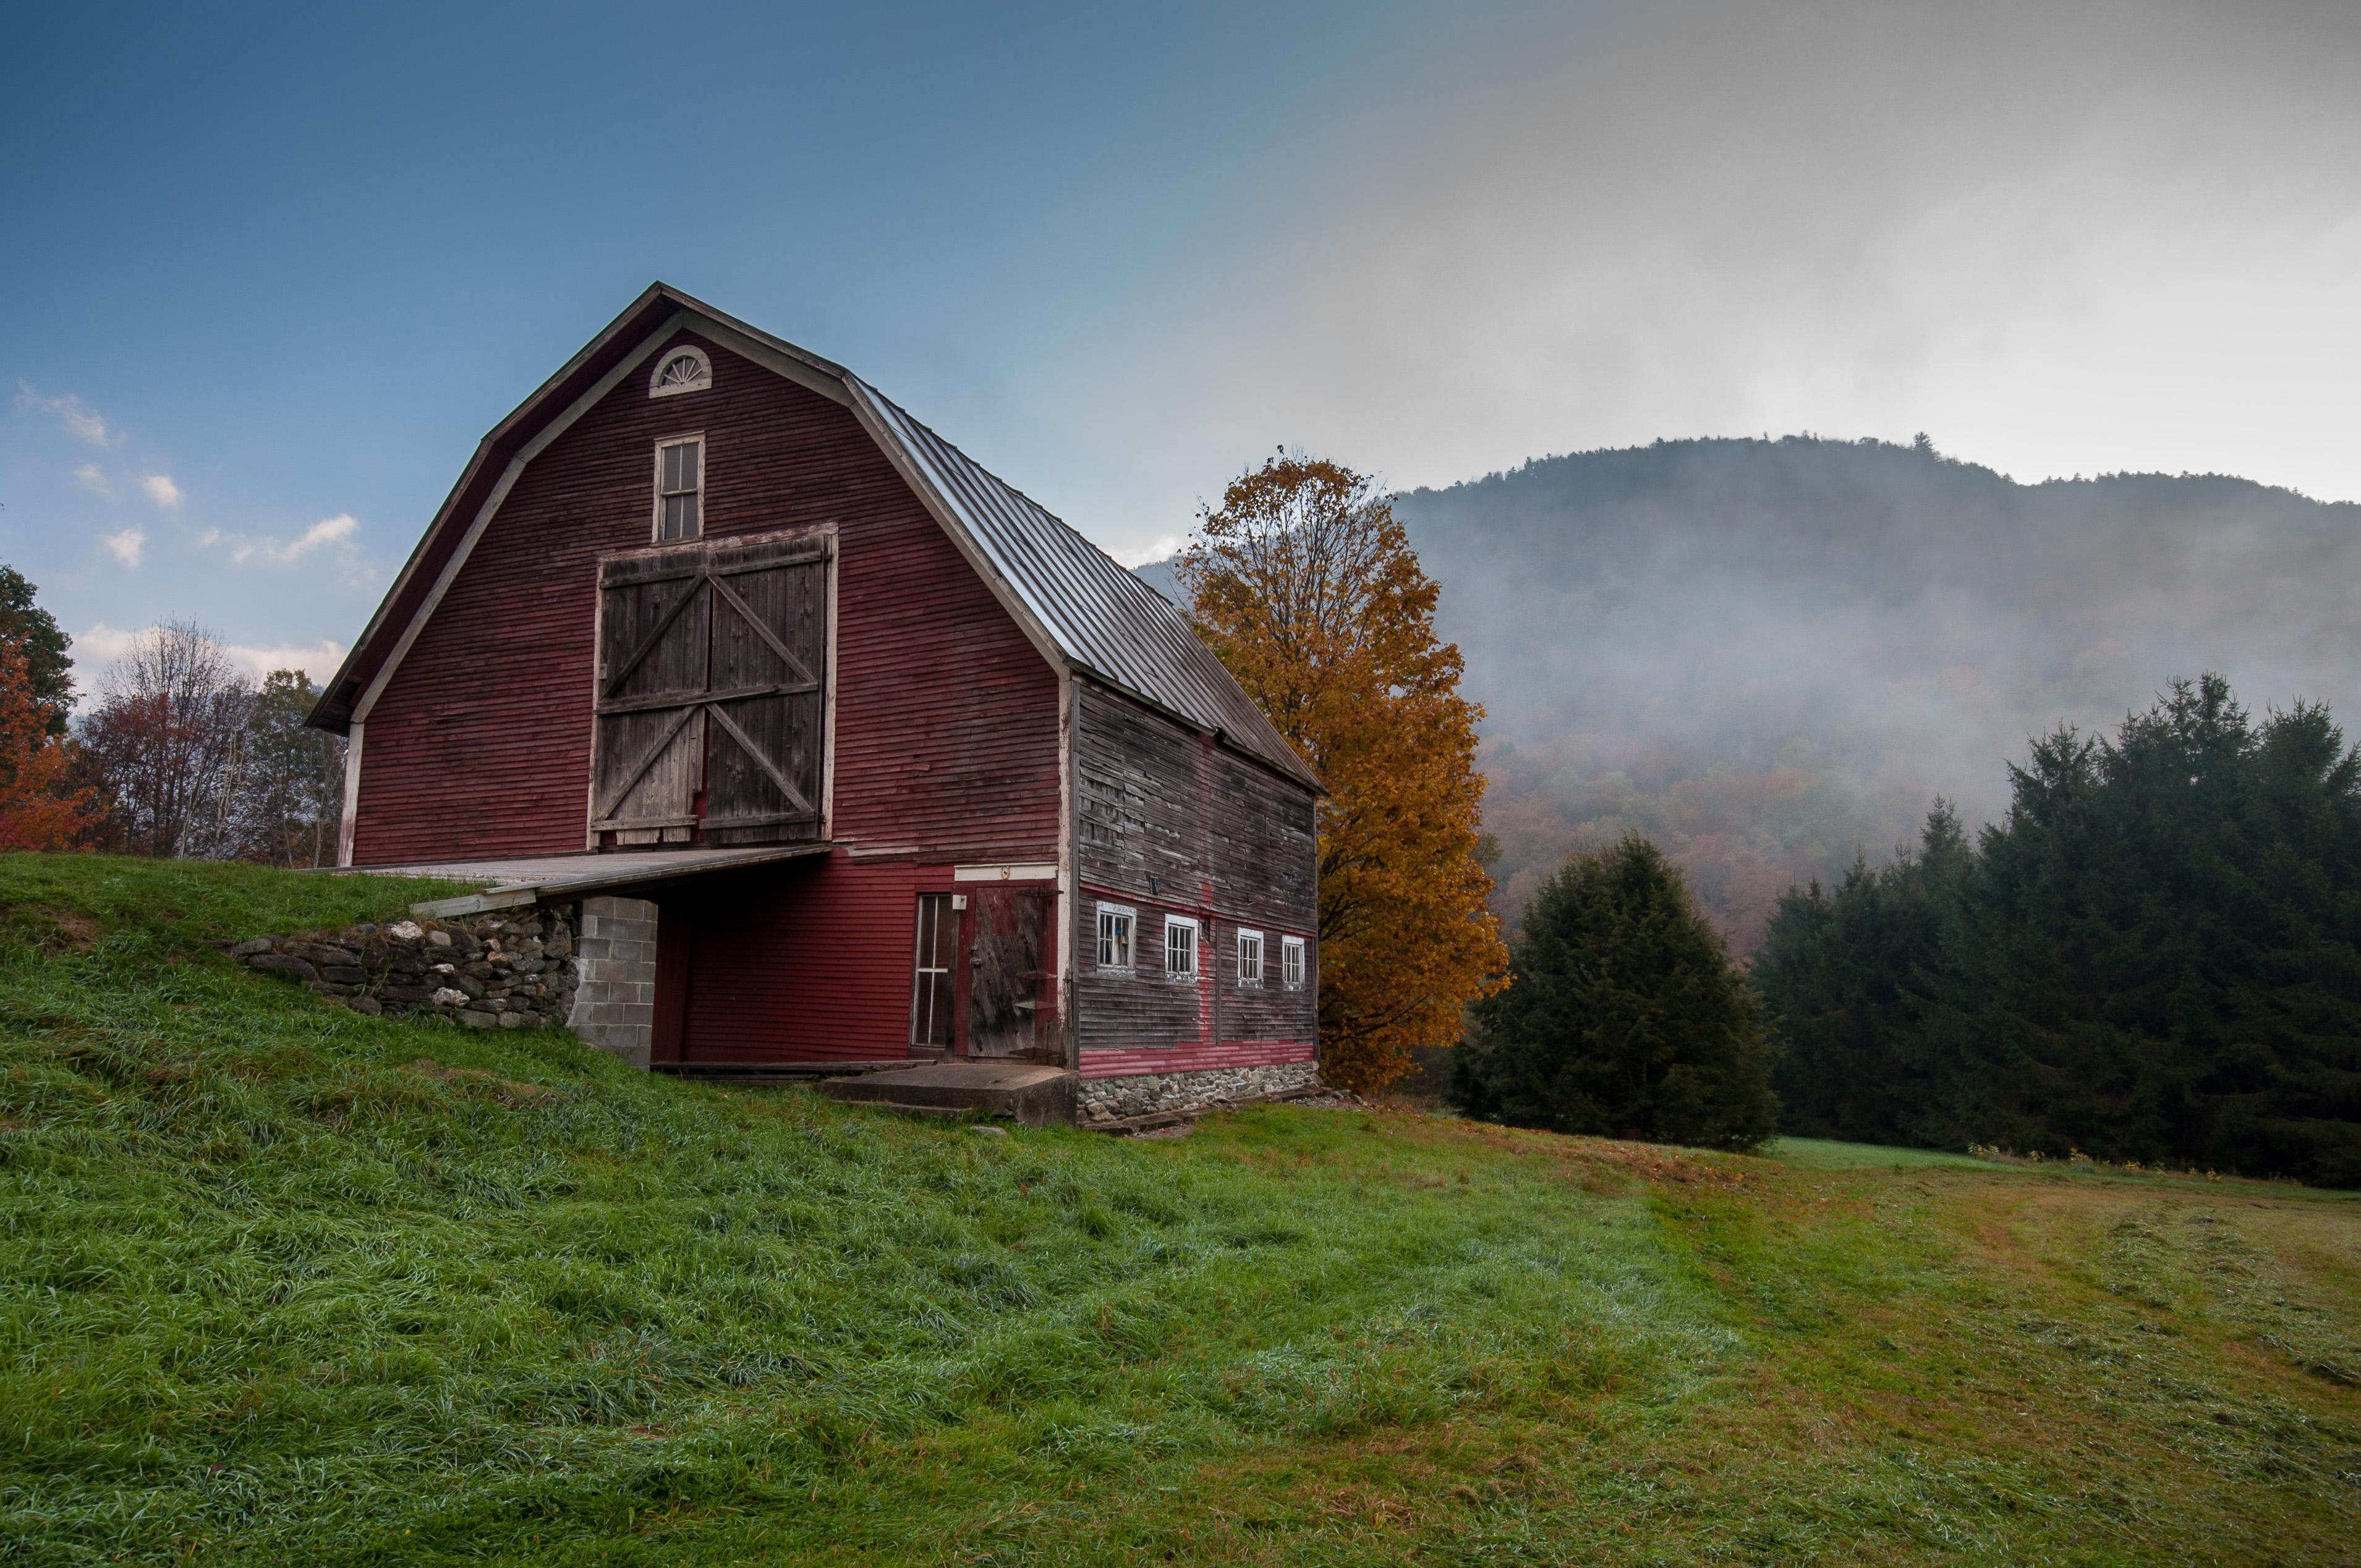 barn wallpaper - photo #33